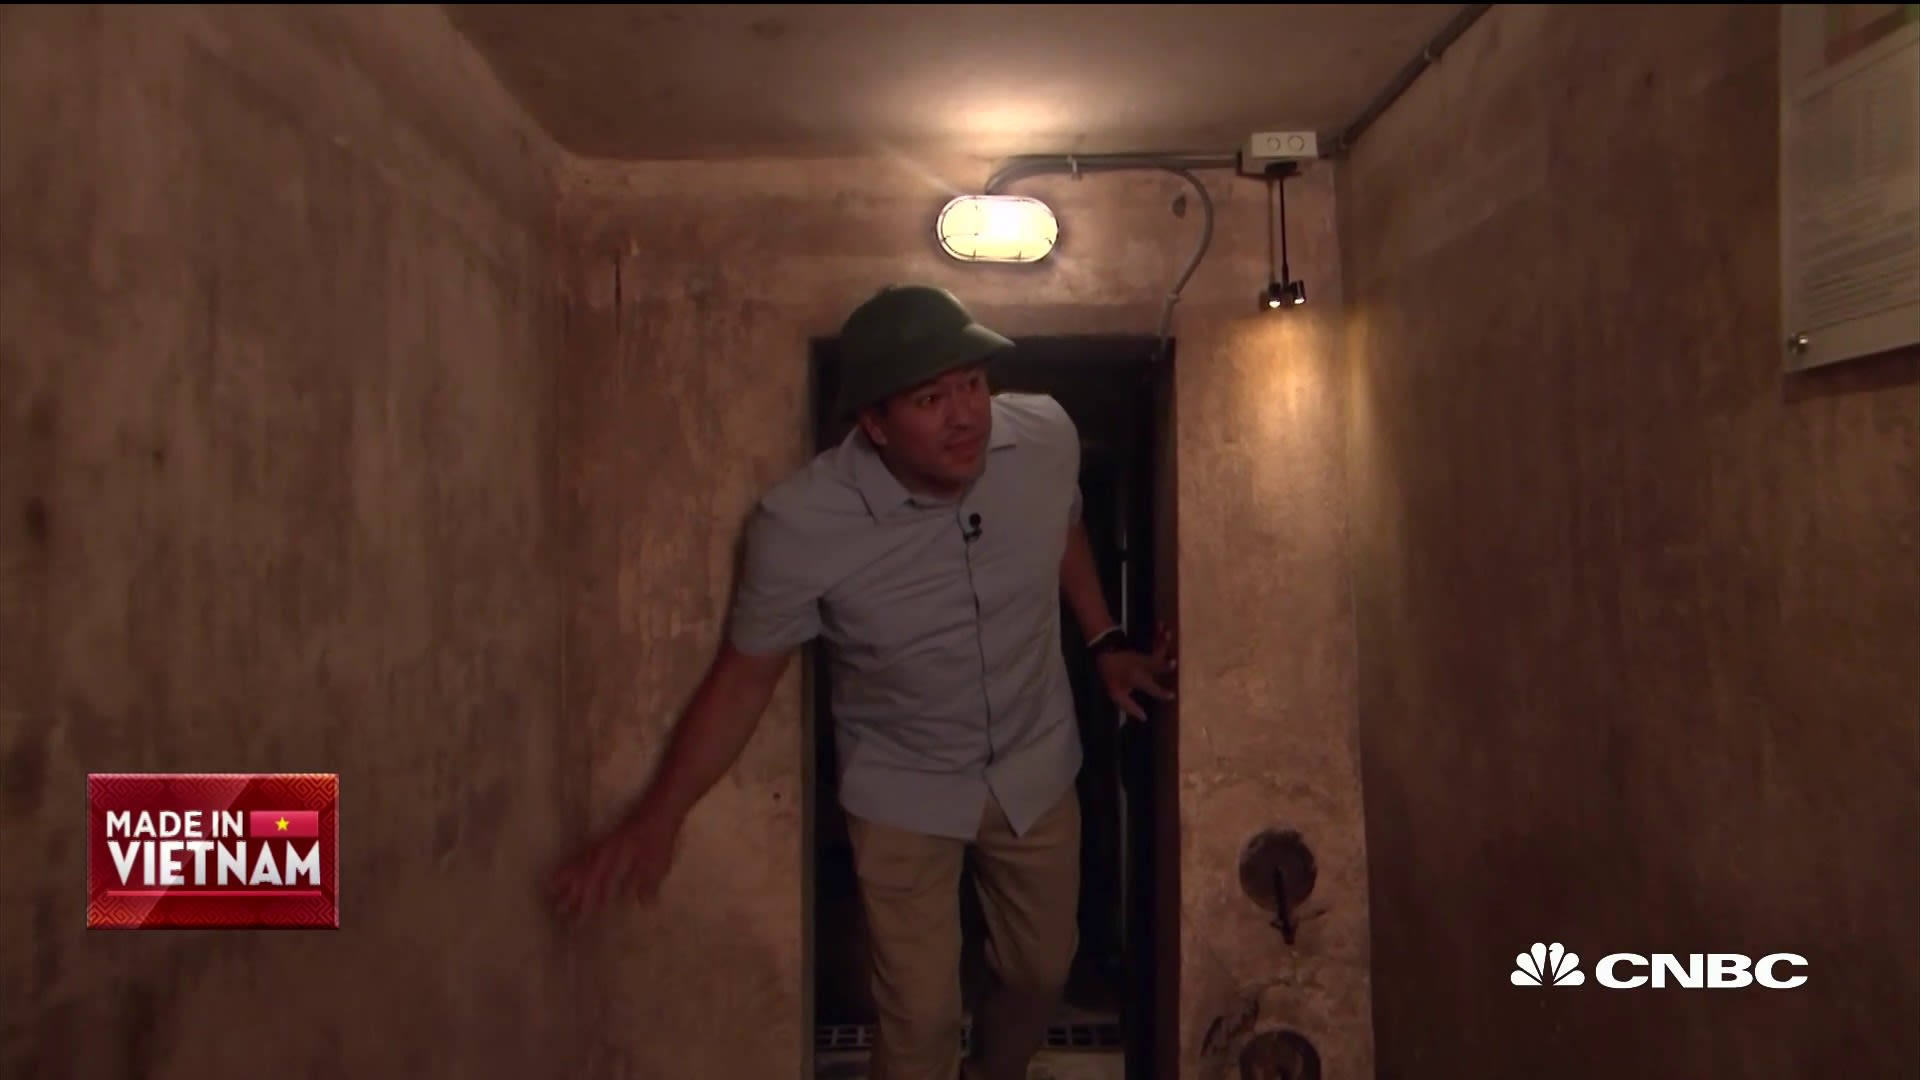 Go inside the secret Vietnam War bomb shelter found in the bowels of Hanoi's oldest hotel